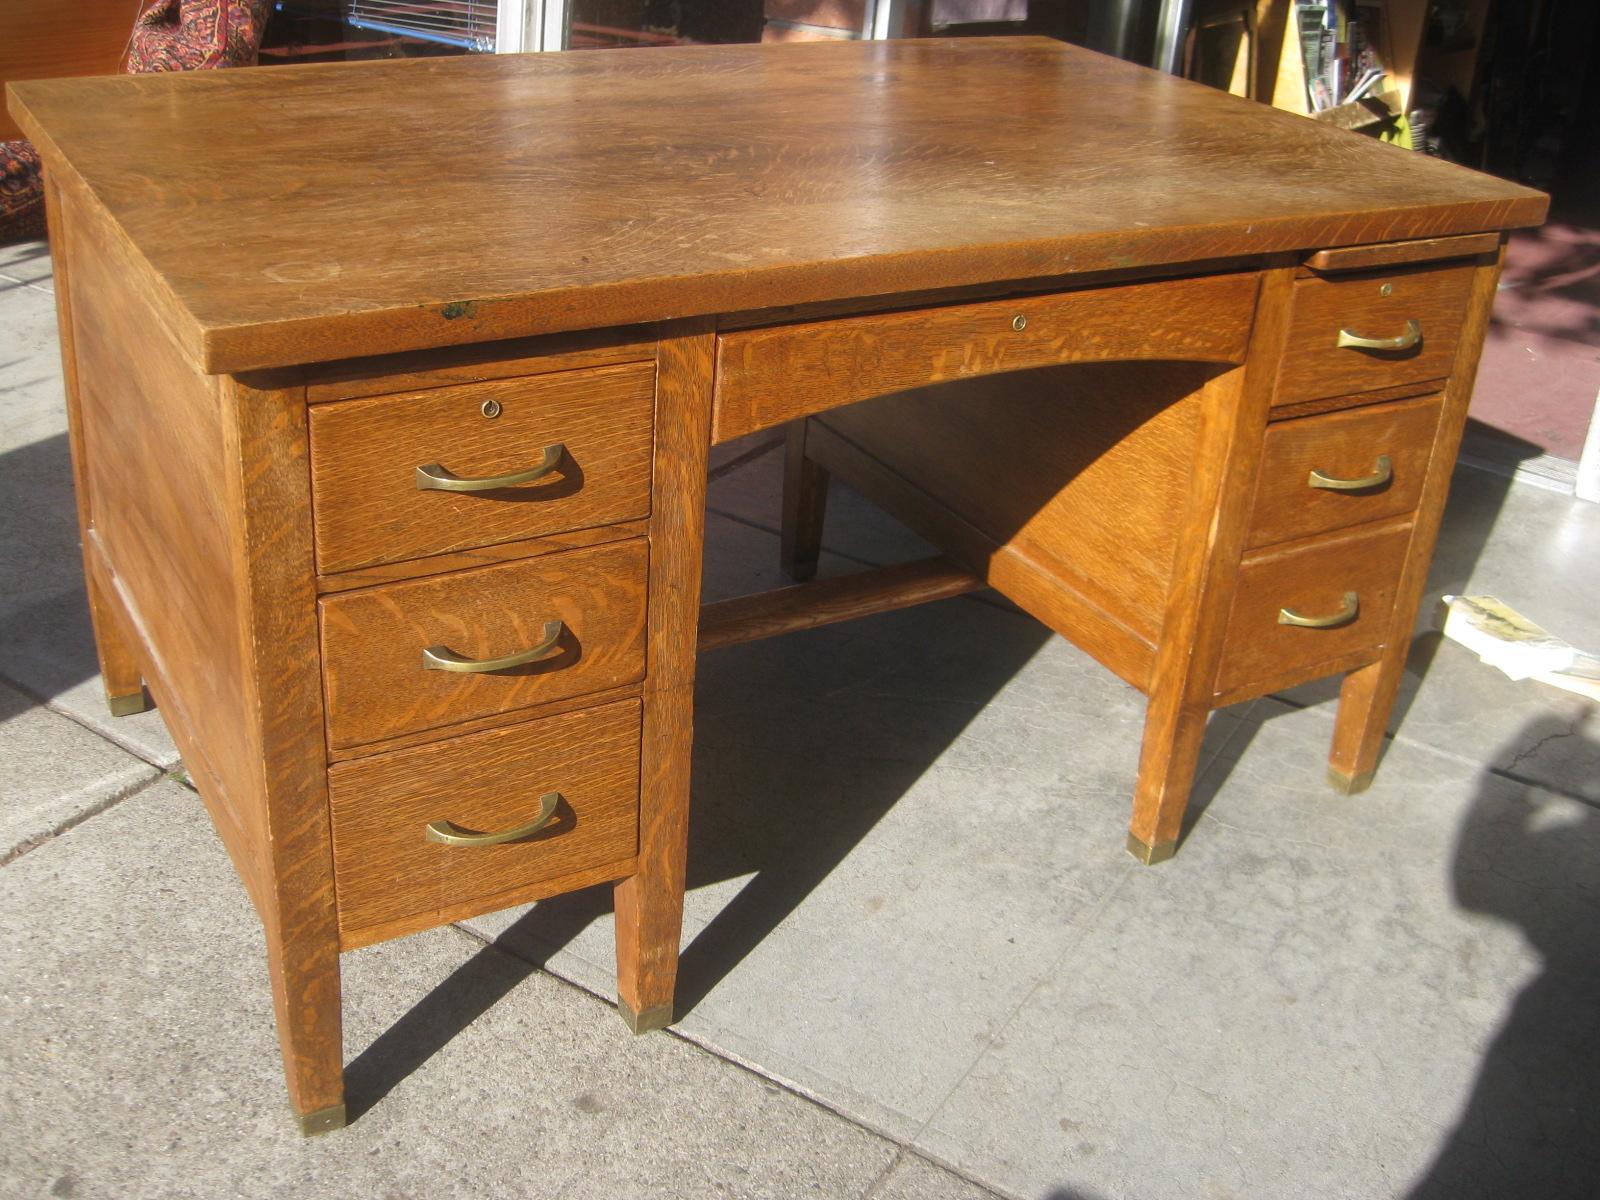 Uhuru furniture collectibles sold great oak teacher s